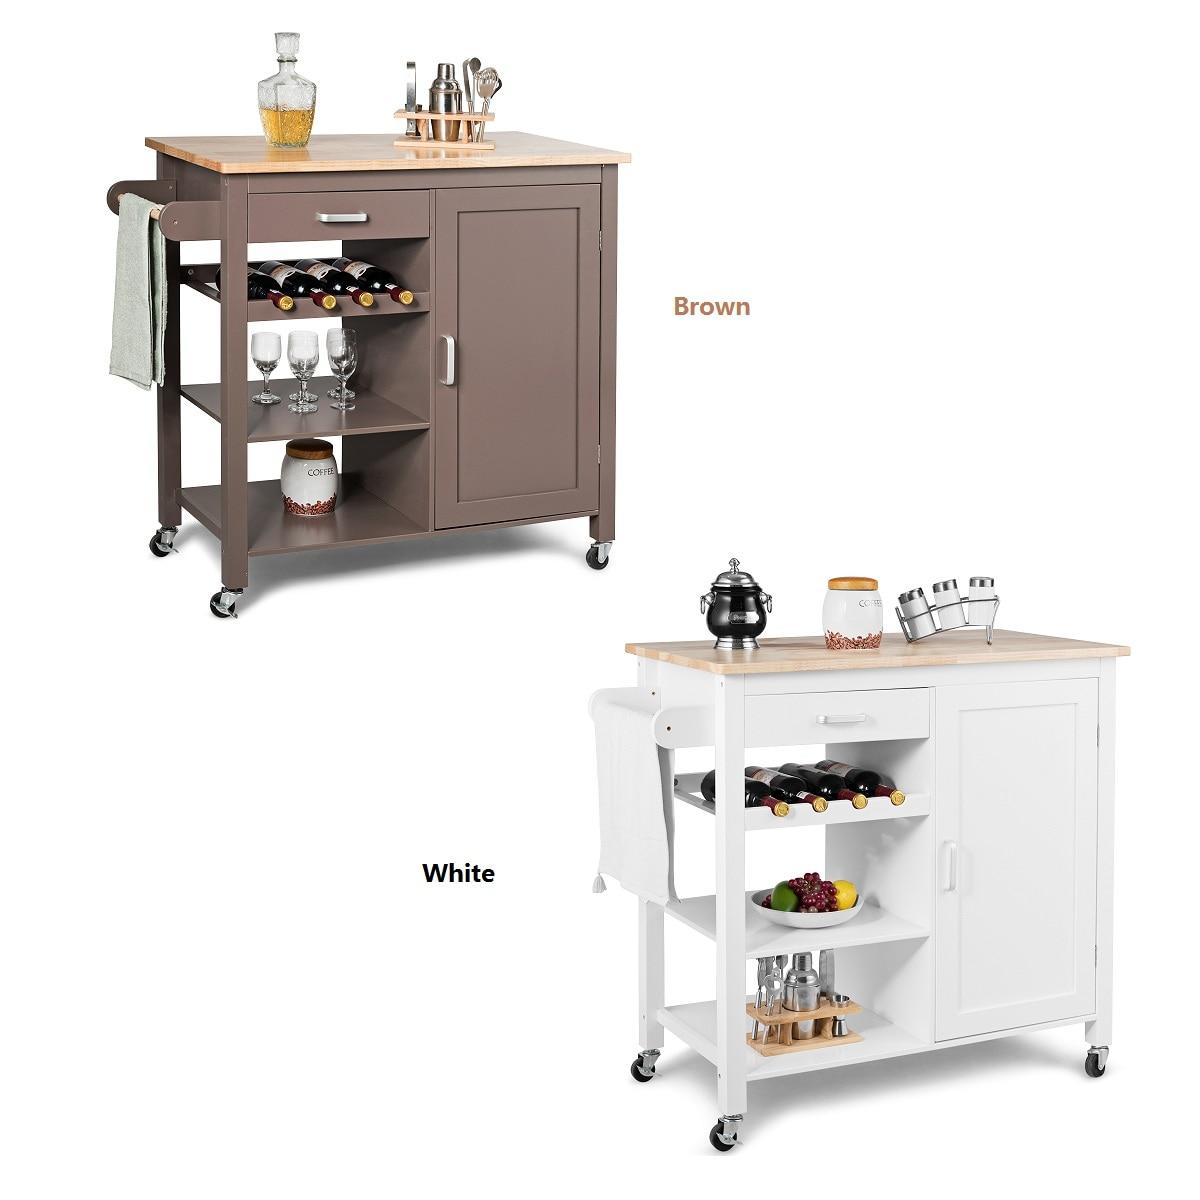 Costway Kitchen Island Trolley Cart Wood Top Storage Cabinet W/ Wine Rack & Shelf WhiteBrown